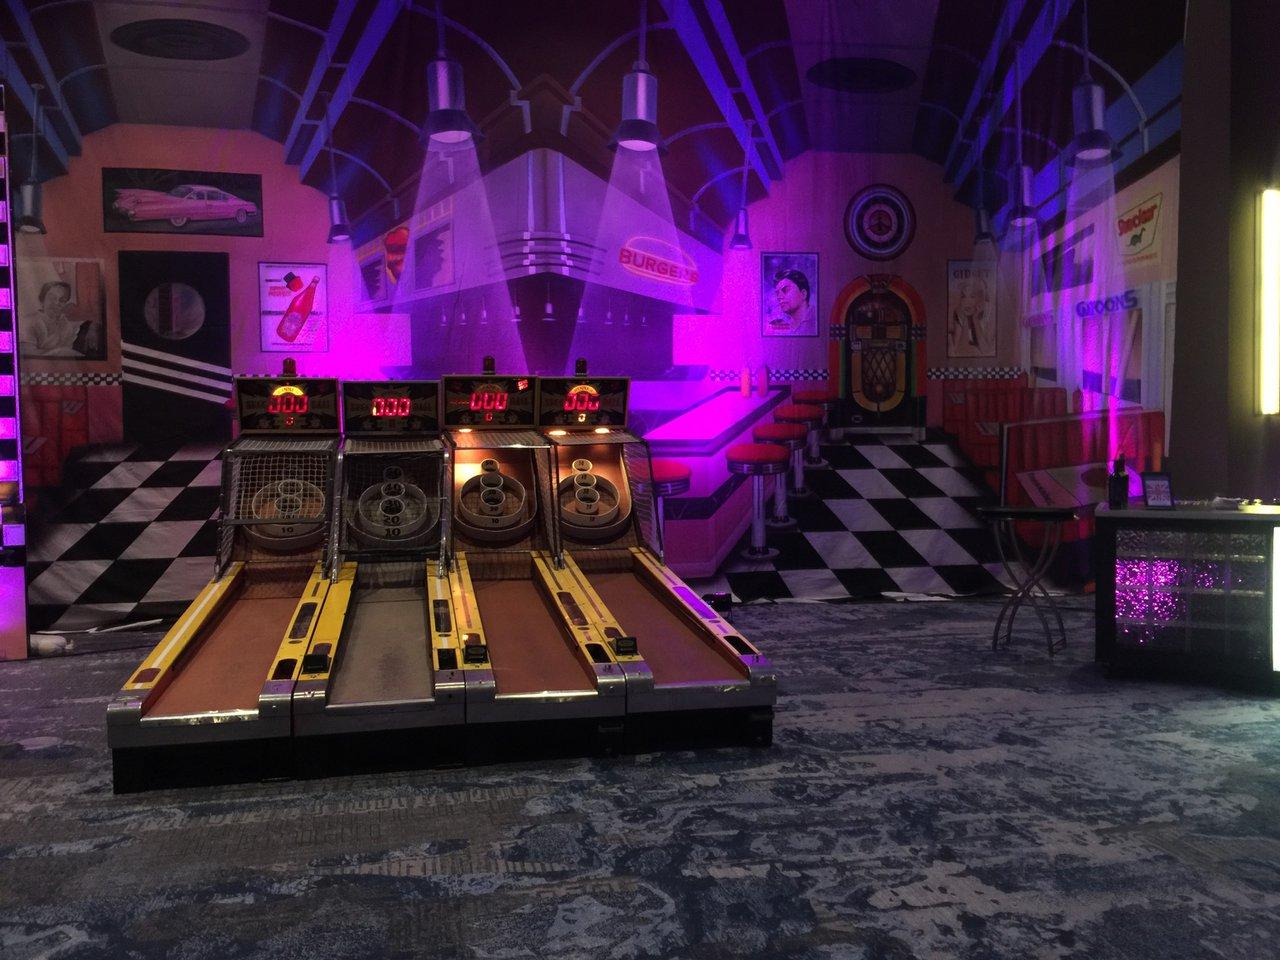 rock n roll photo ijo skiball diner.jpg